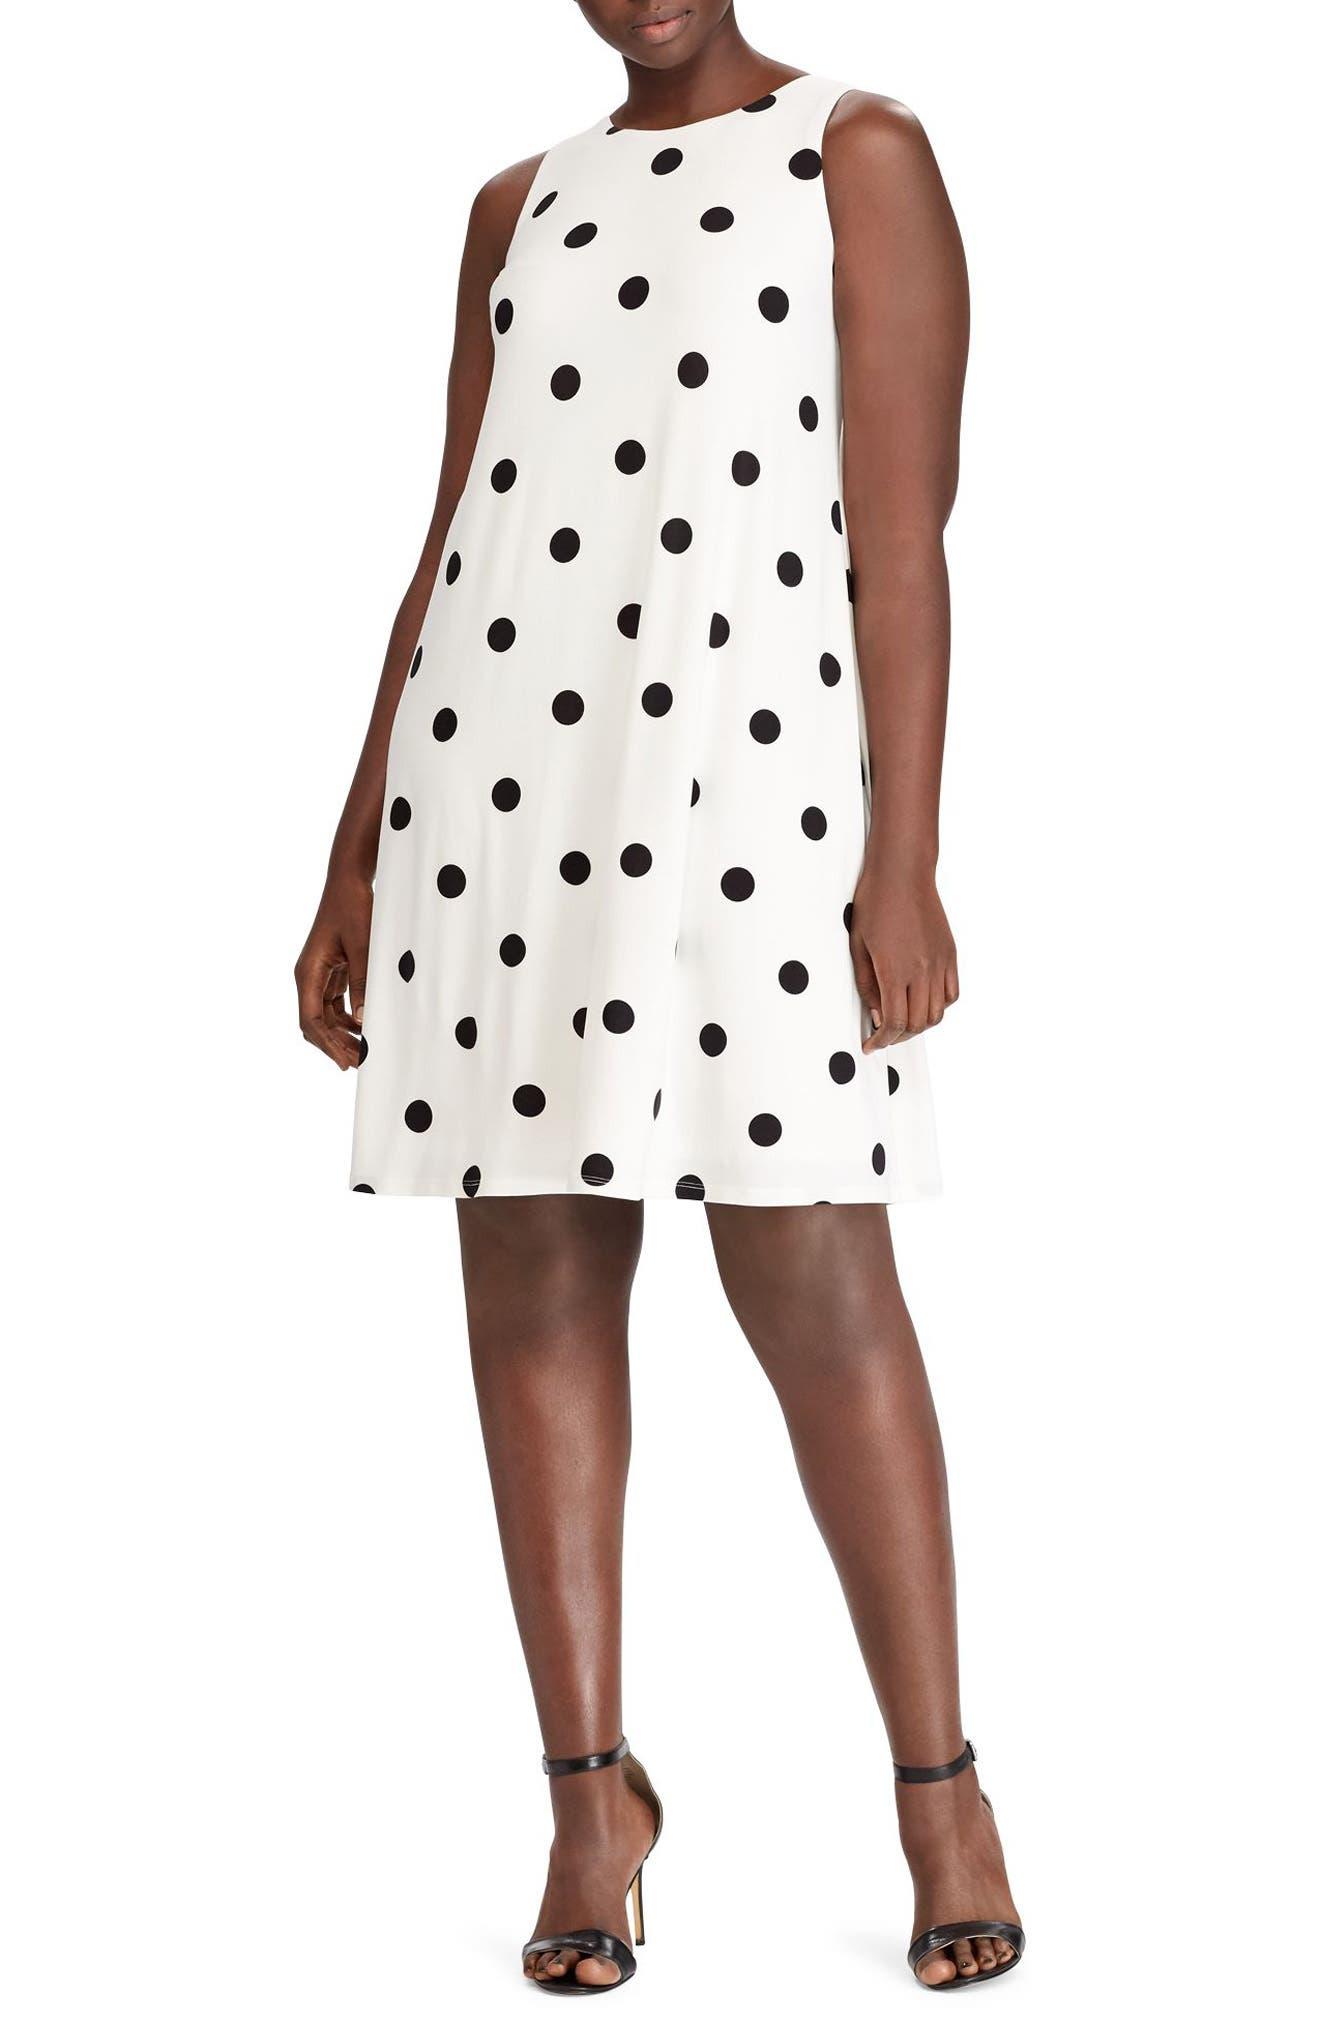 Peninsula Dot A-Line Dress,                             Main thumbnail 1, color,                             101